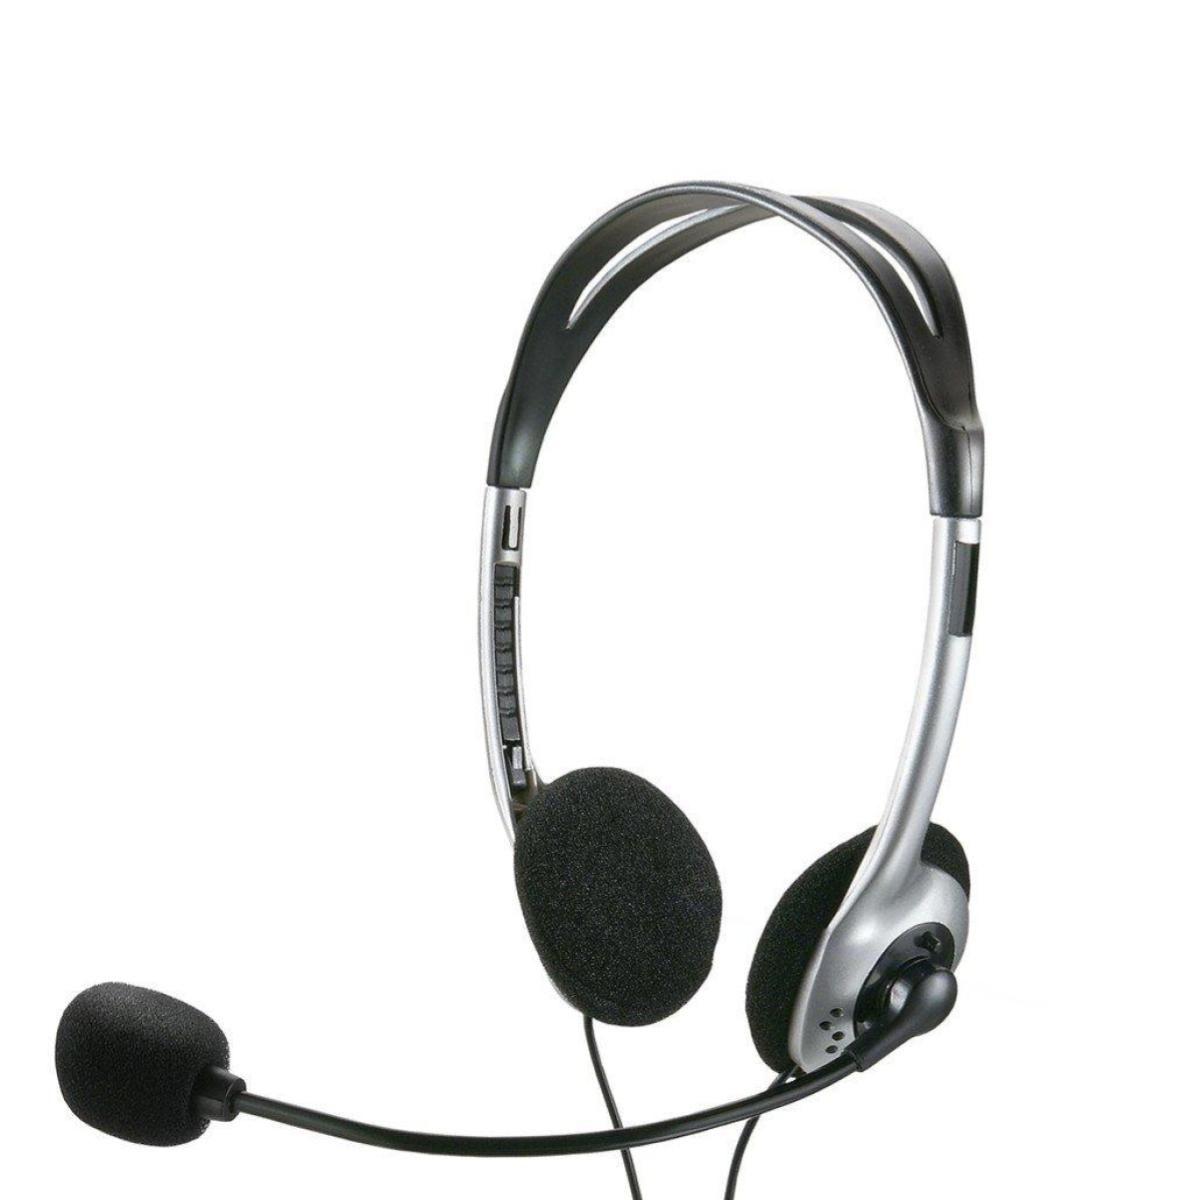 Fone de Ouvido Com Microfone Multilaser